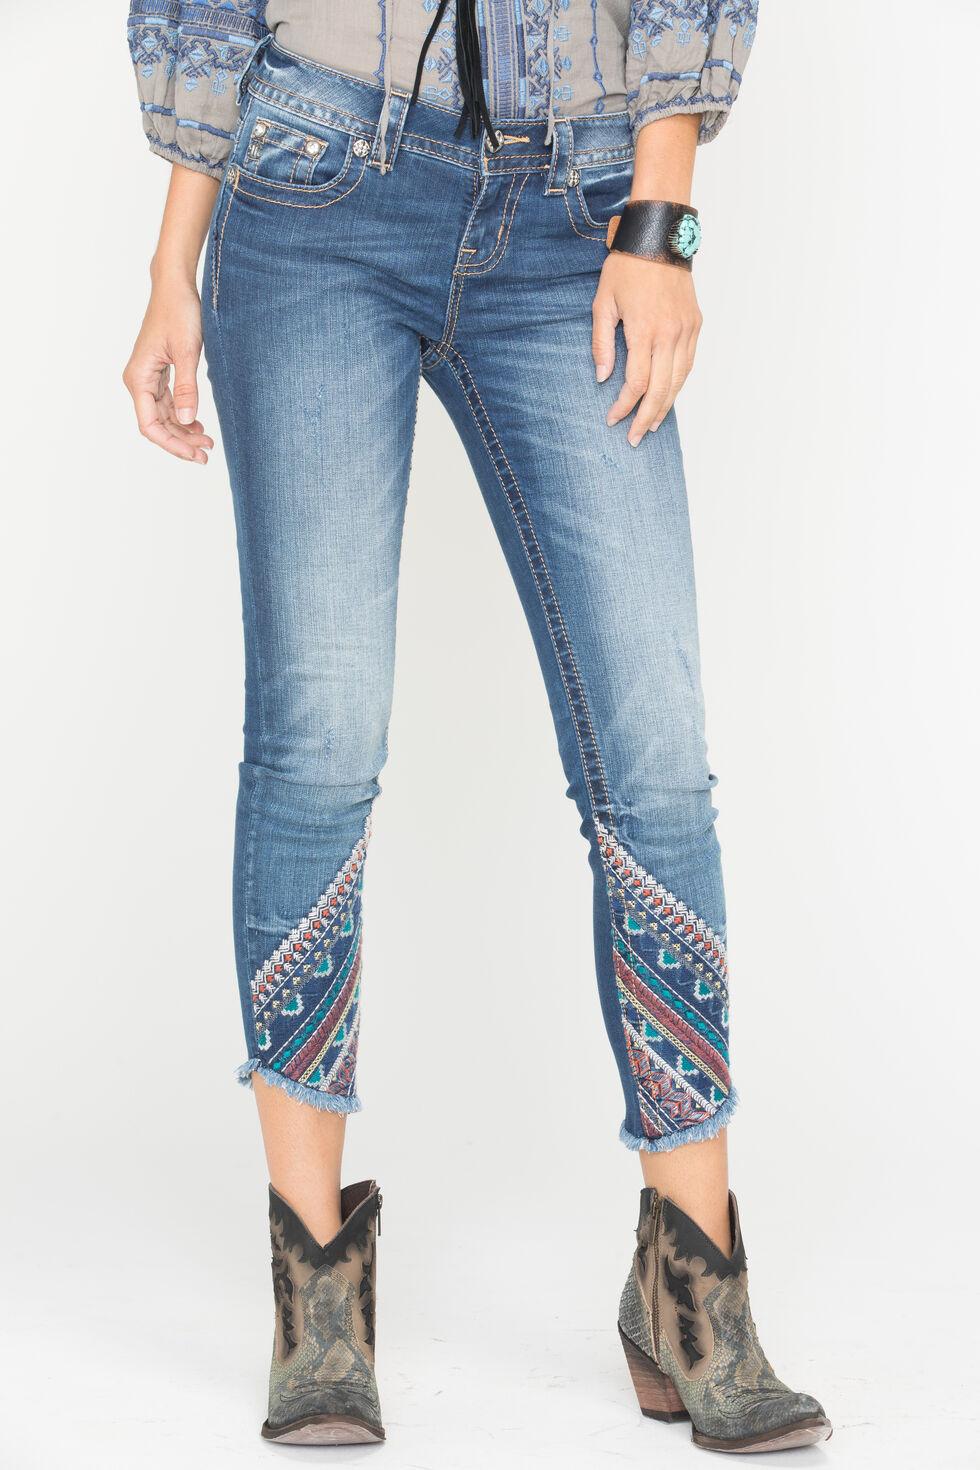 Miss Me Women's Gypsy Tales Ankle Skinny Jeans, Indigo, hi-res